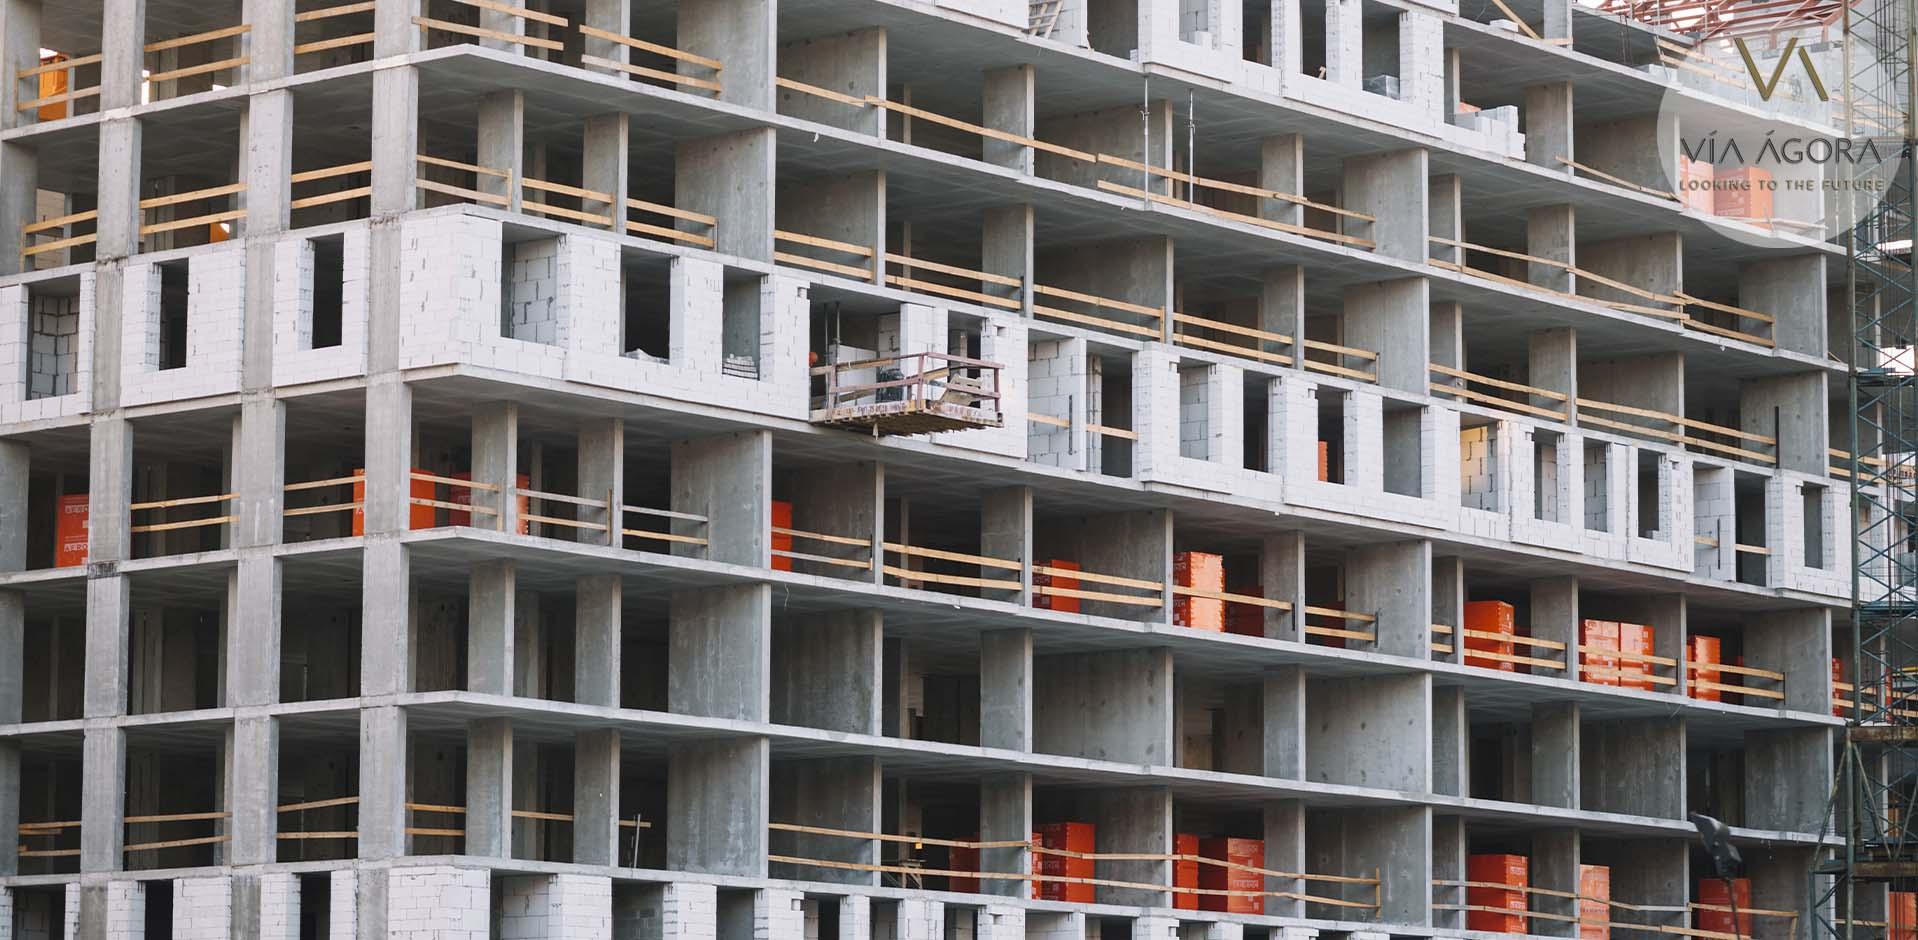 via agora - promotora inmobiliaria - materiales sostenibles